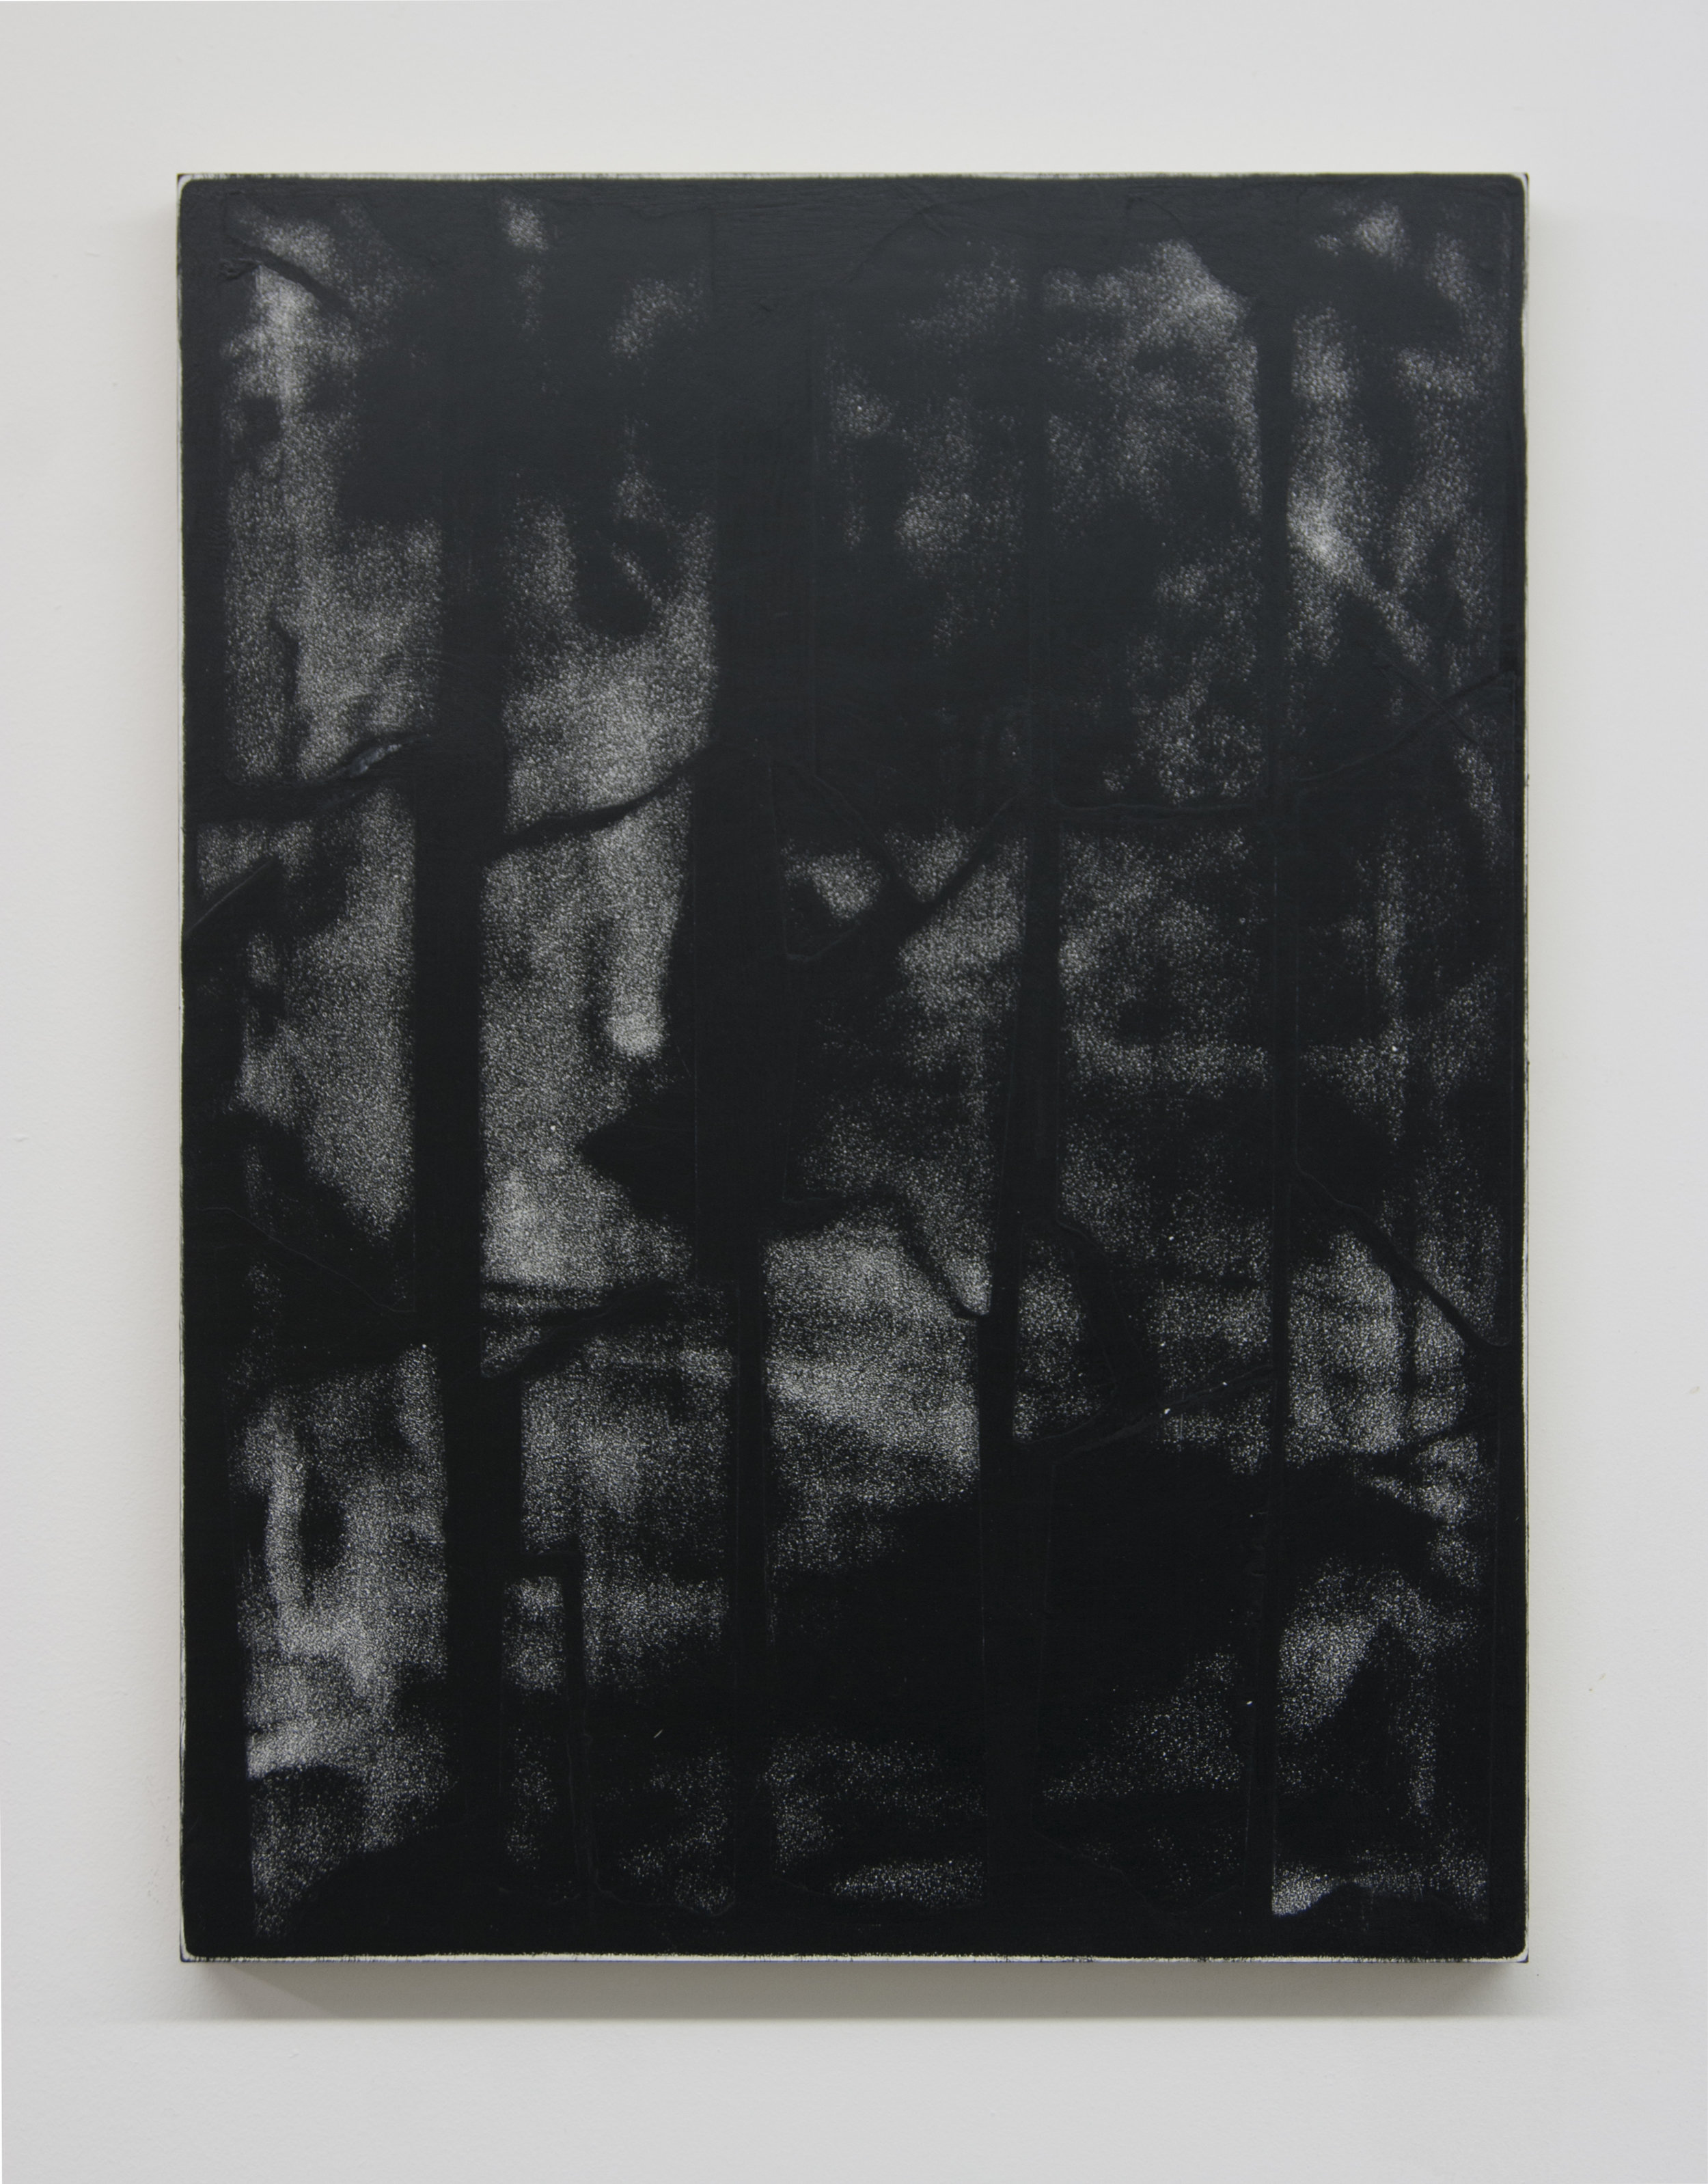 Primal Brain, 2018  Acrylic on panel, 16 x 12 inches